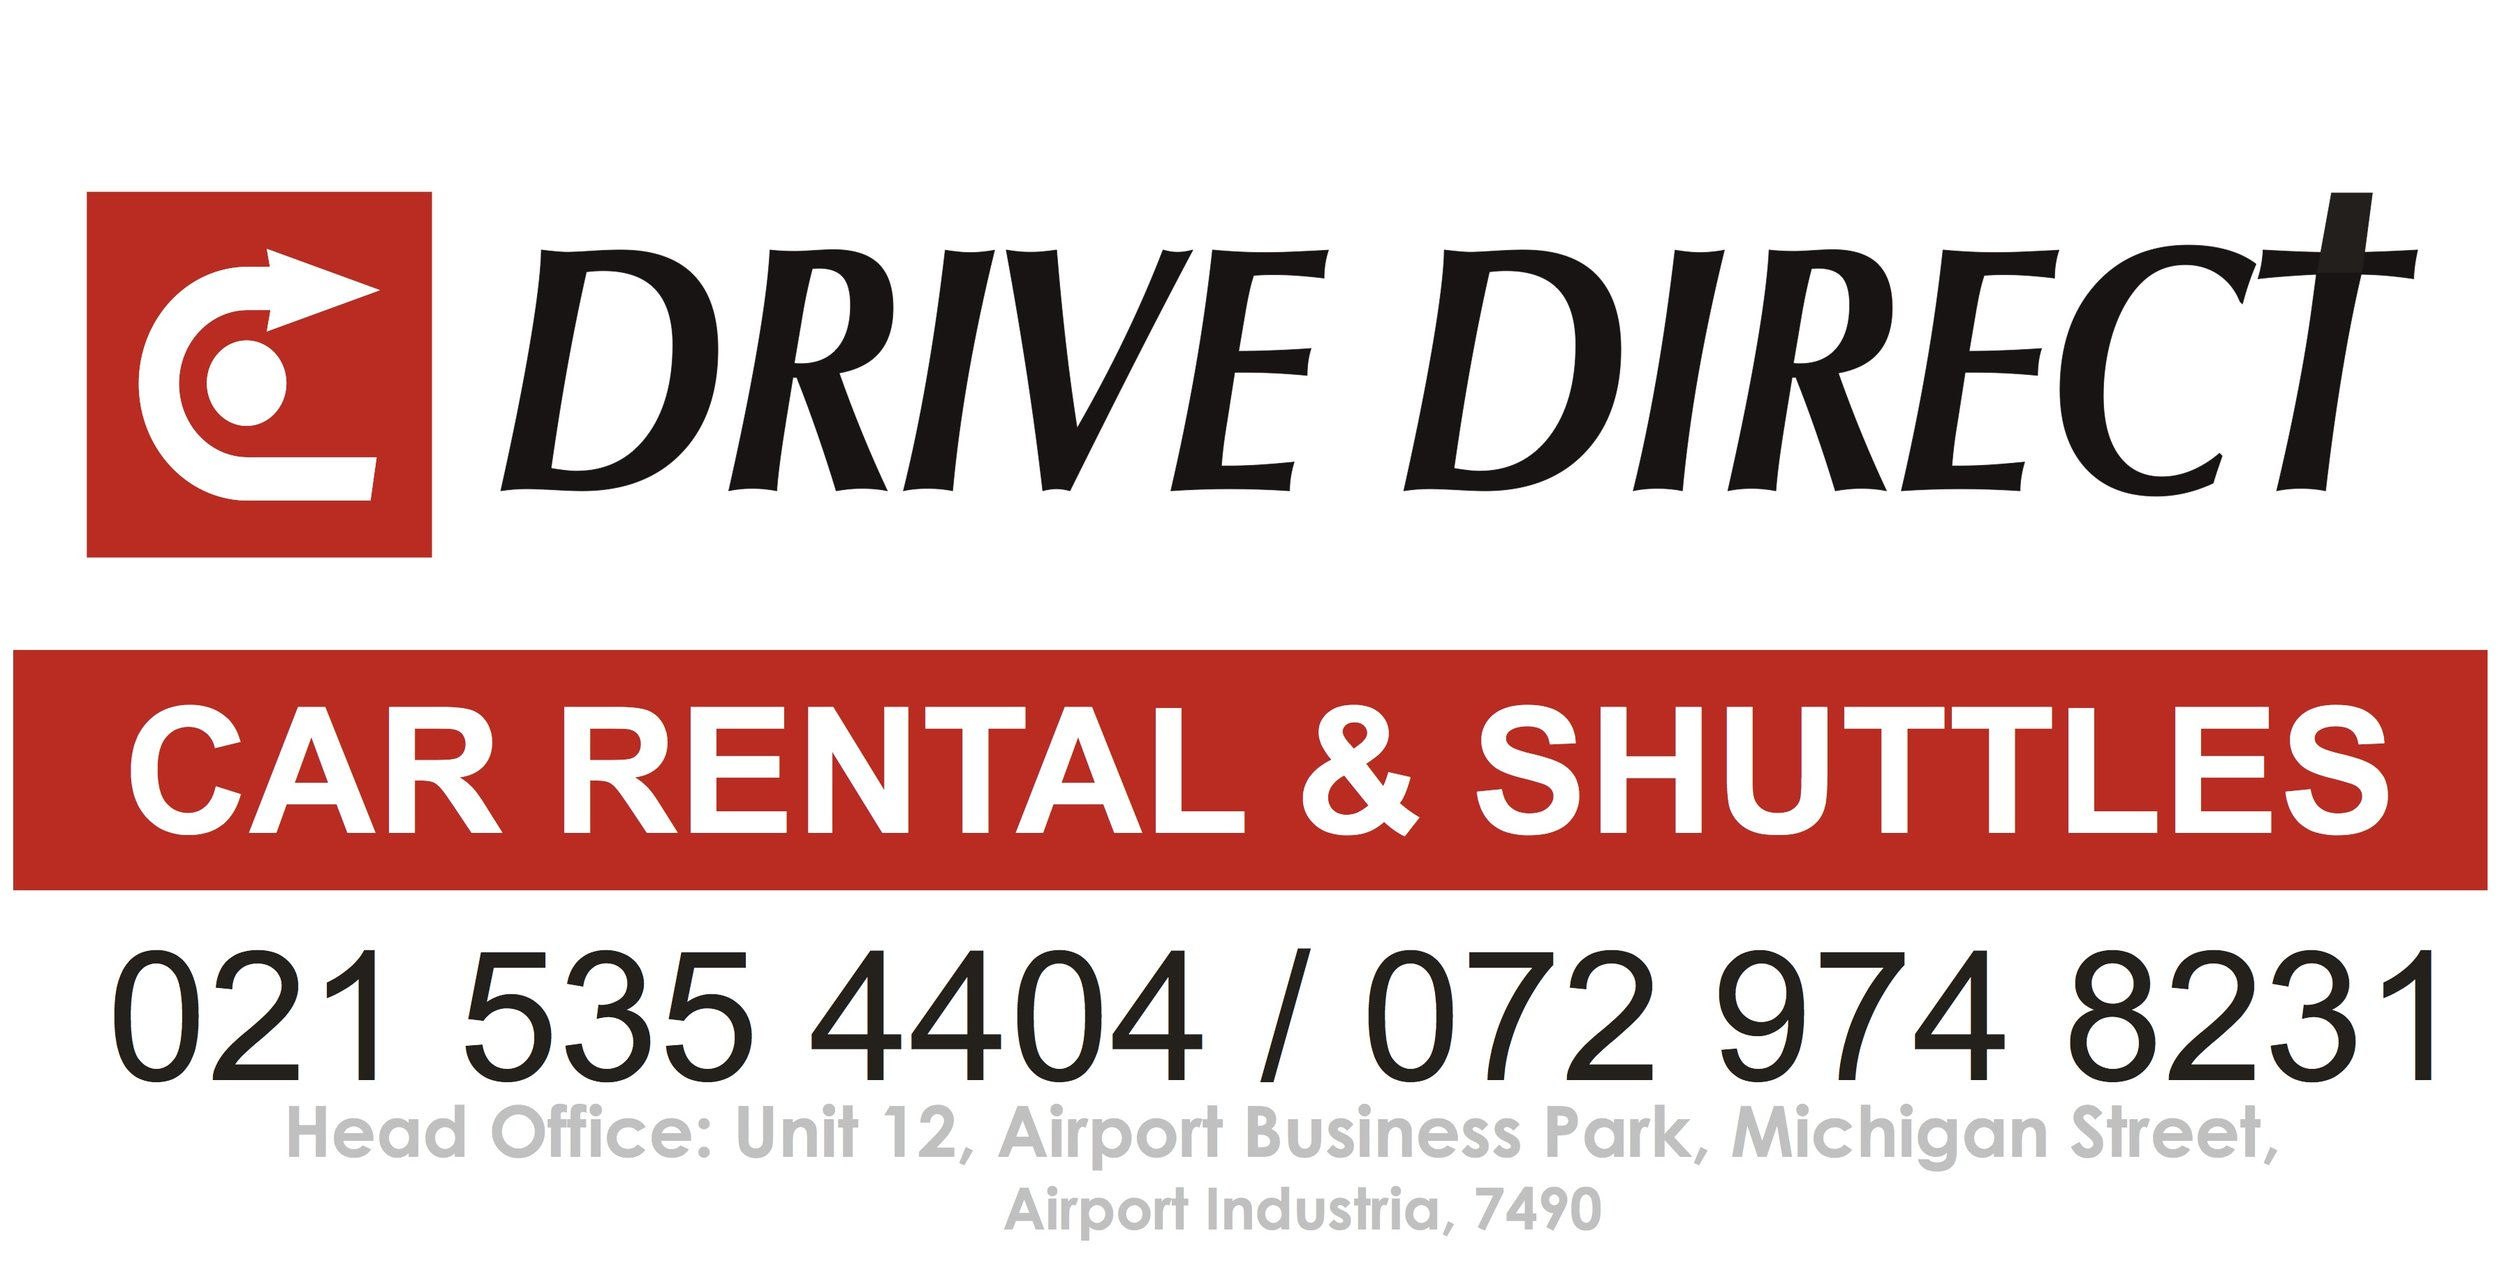 DRIVE DIRECT VEHICLE MAGNET.jpg